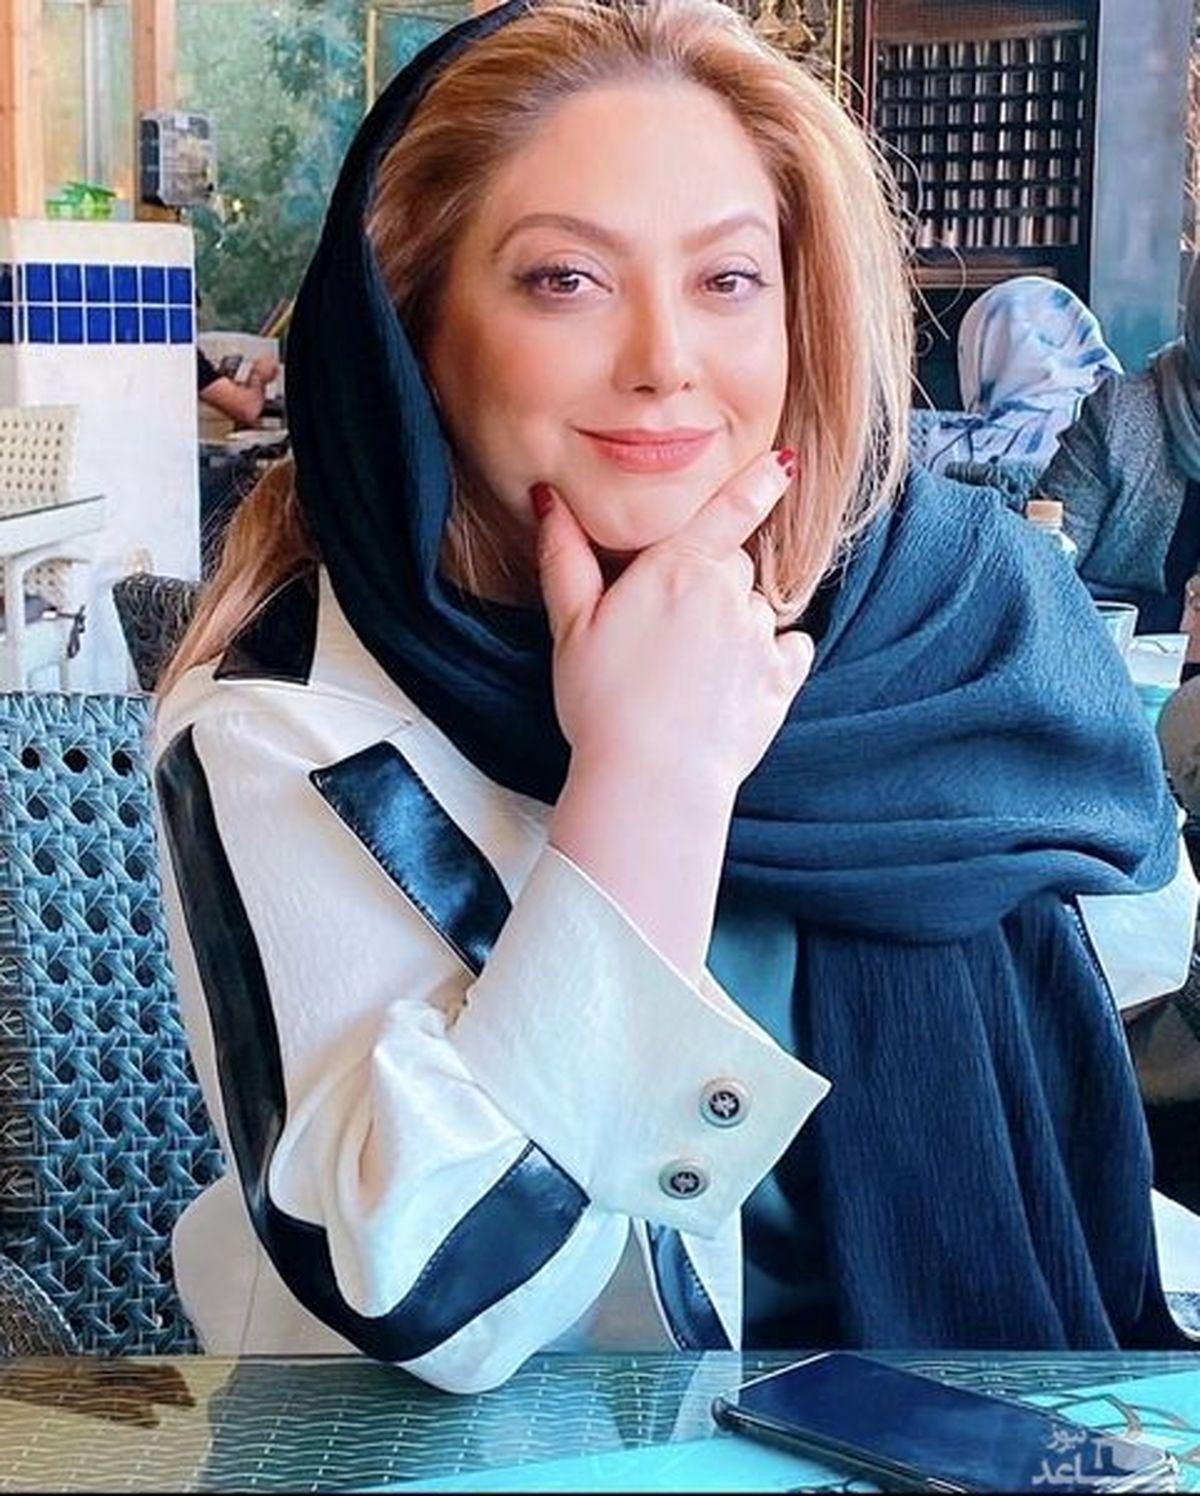 مریم سلطانی در رستوران لاکچری + عکس